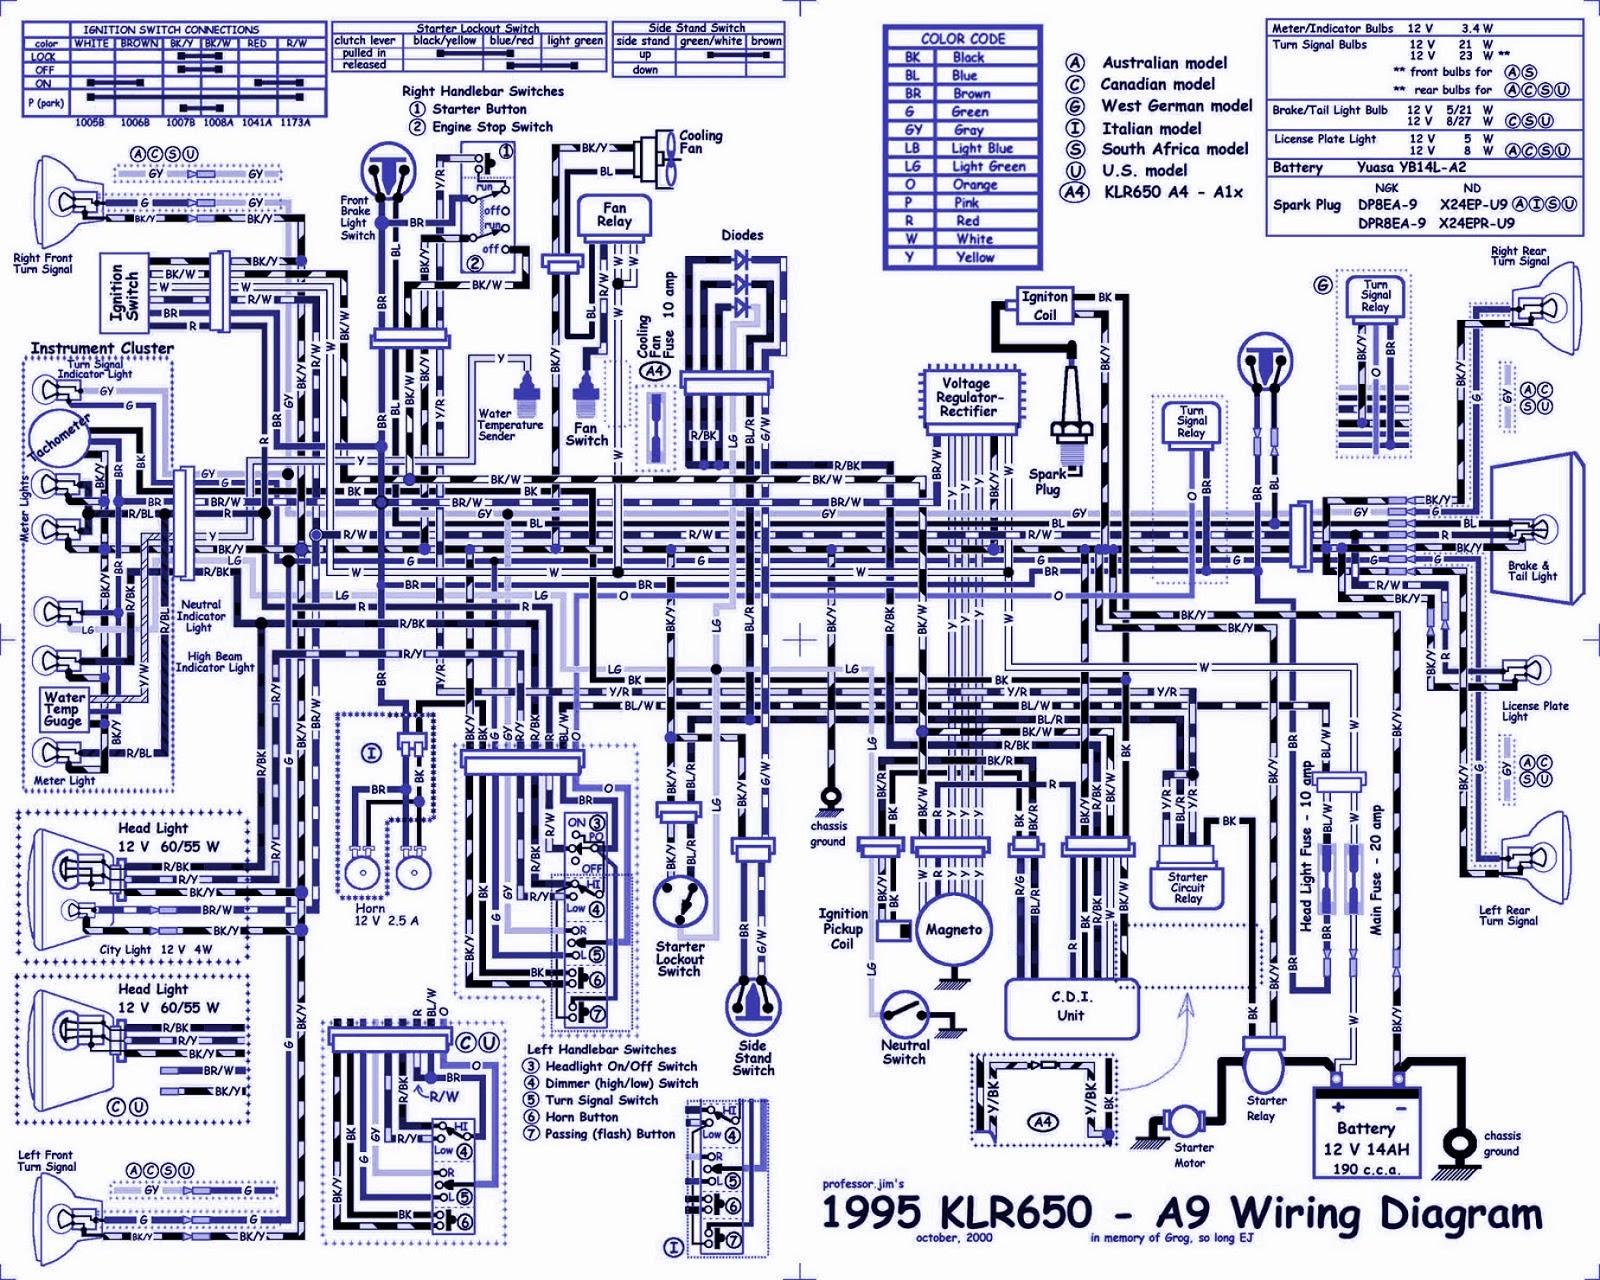 98 monte carlo wiring diagram